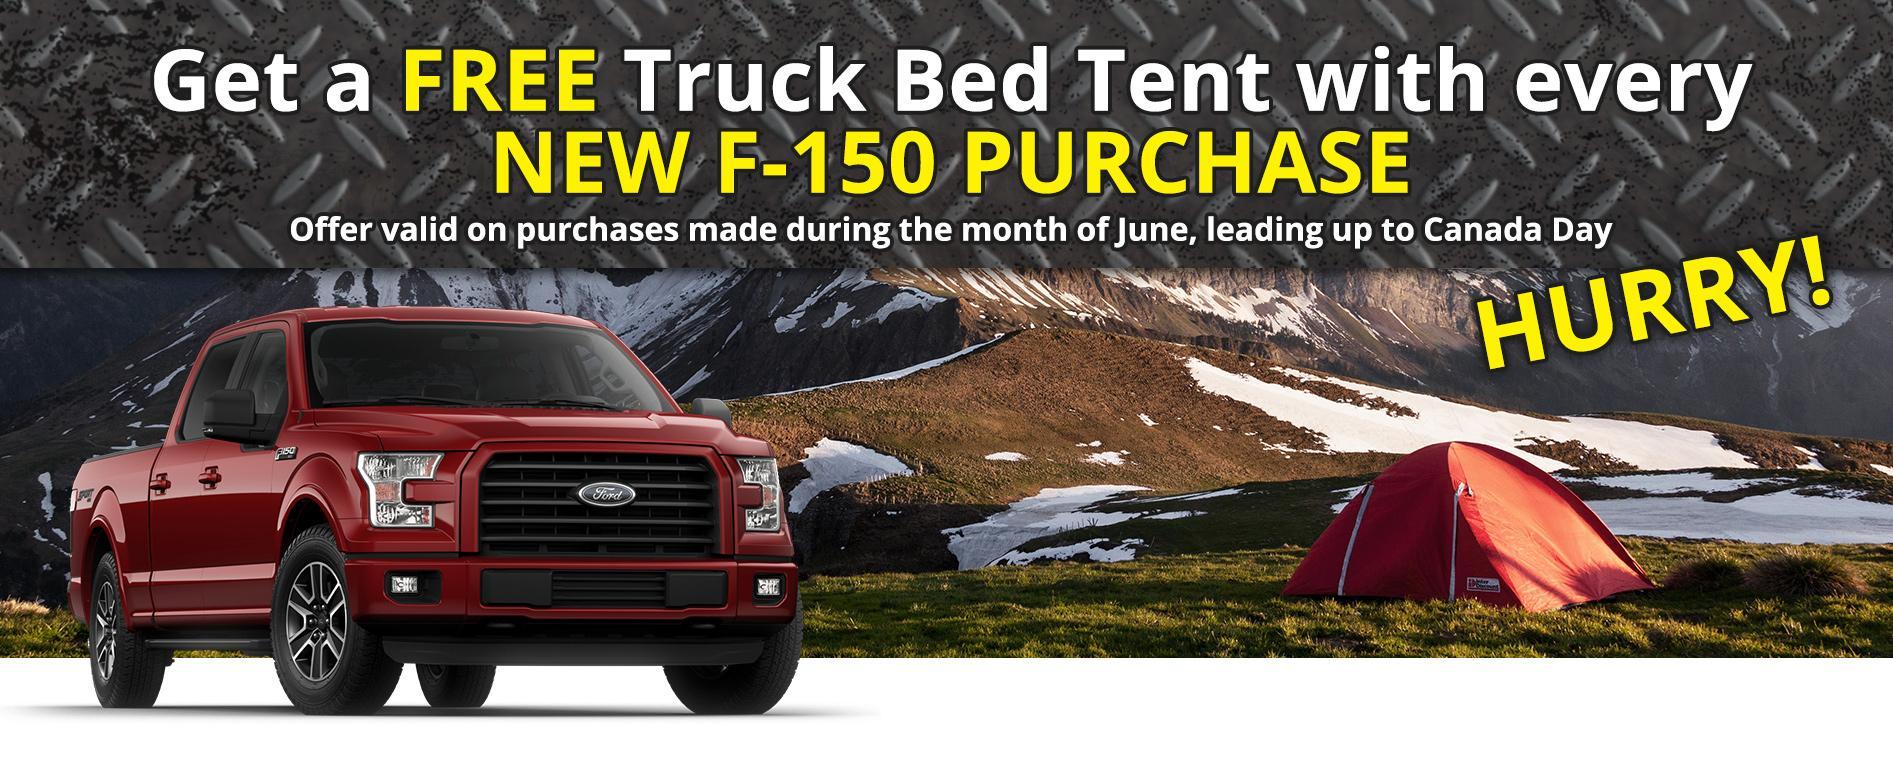 F-150 Truck offer